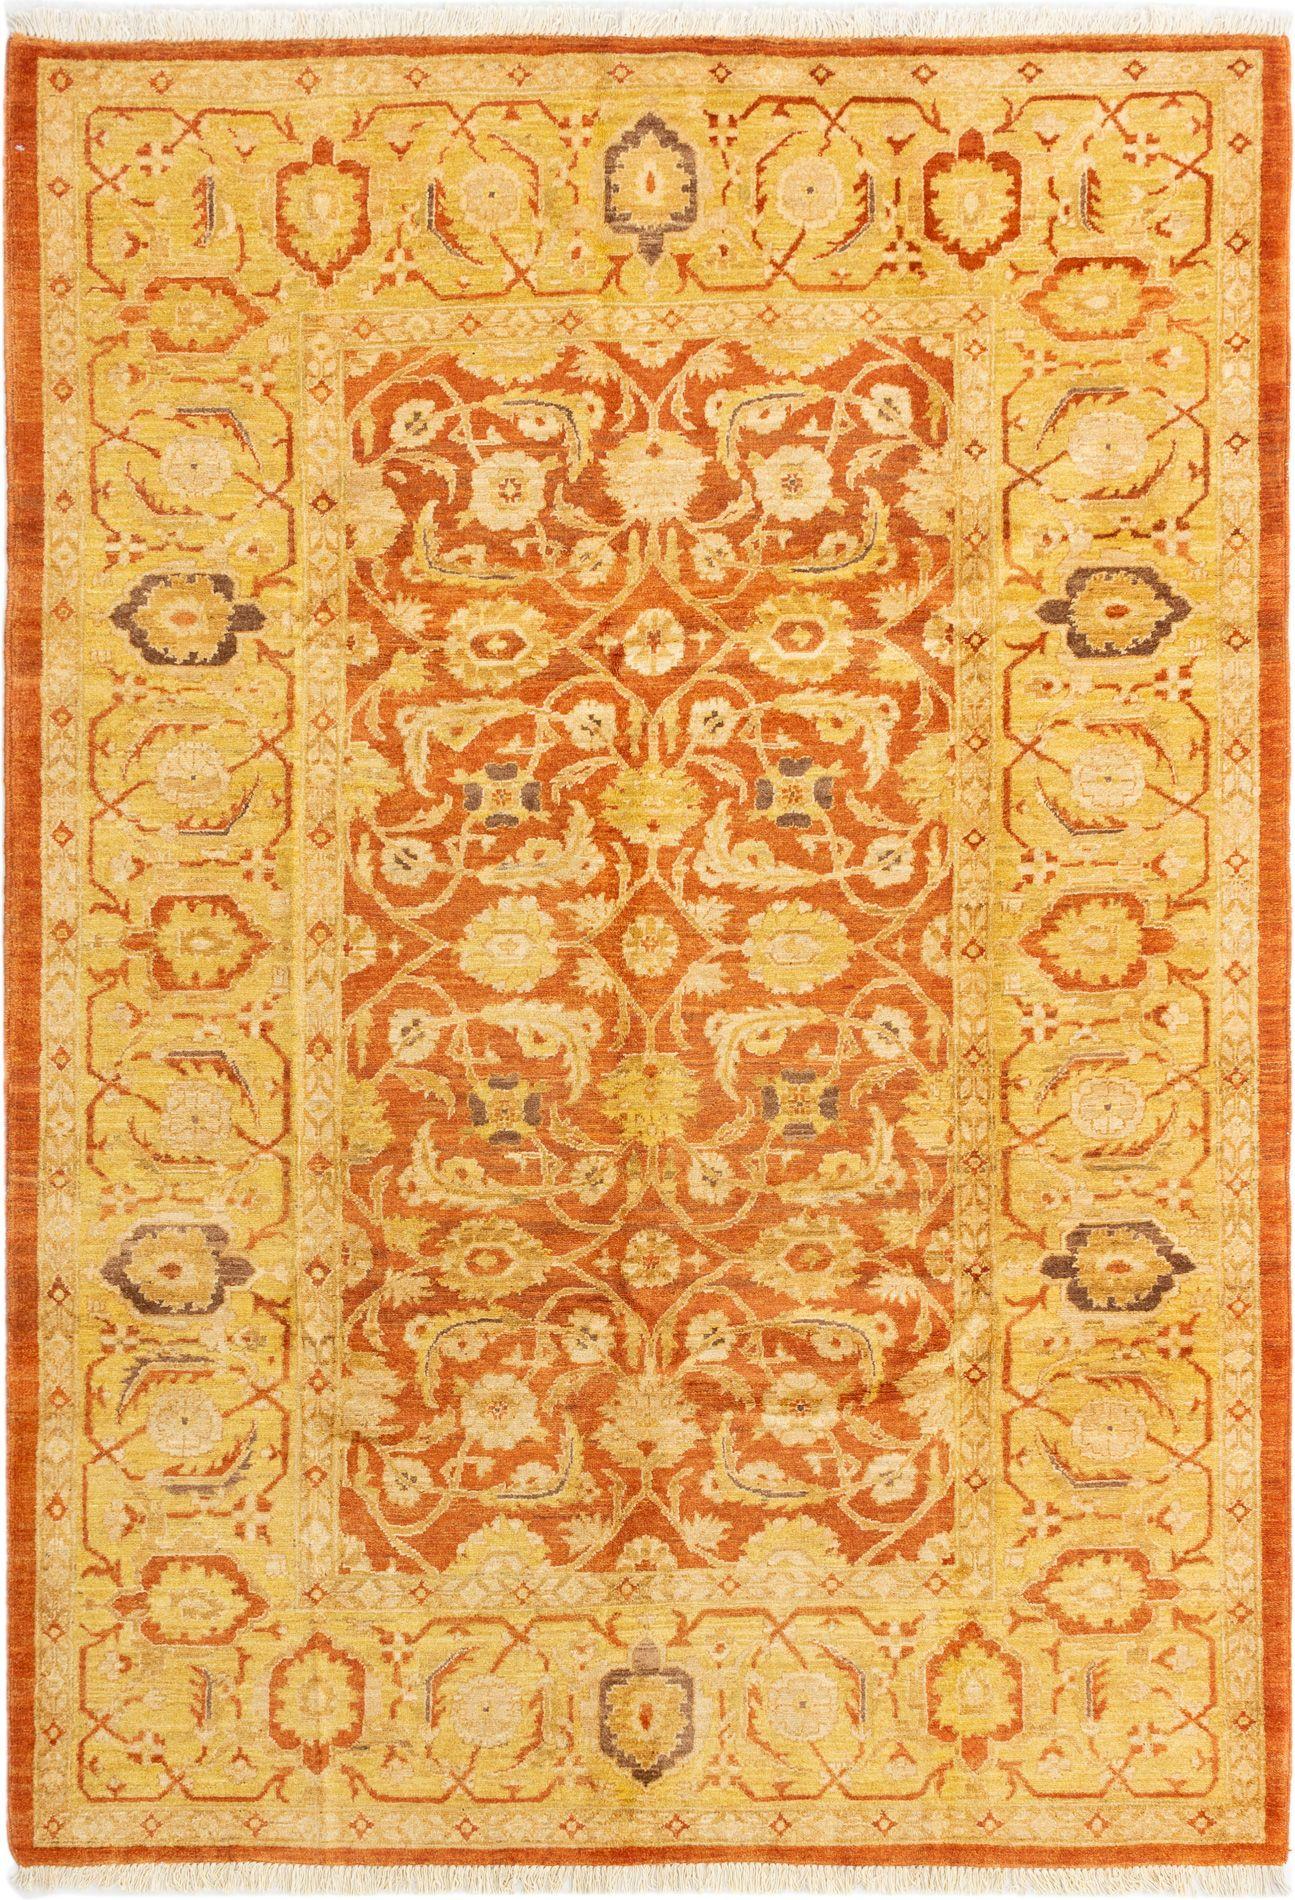 "Hand-knotted Chobi Finest Burnt Orange Wool Rug 6'1"" x 8'9"" Size: 6'1"" x 8'9"""